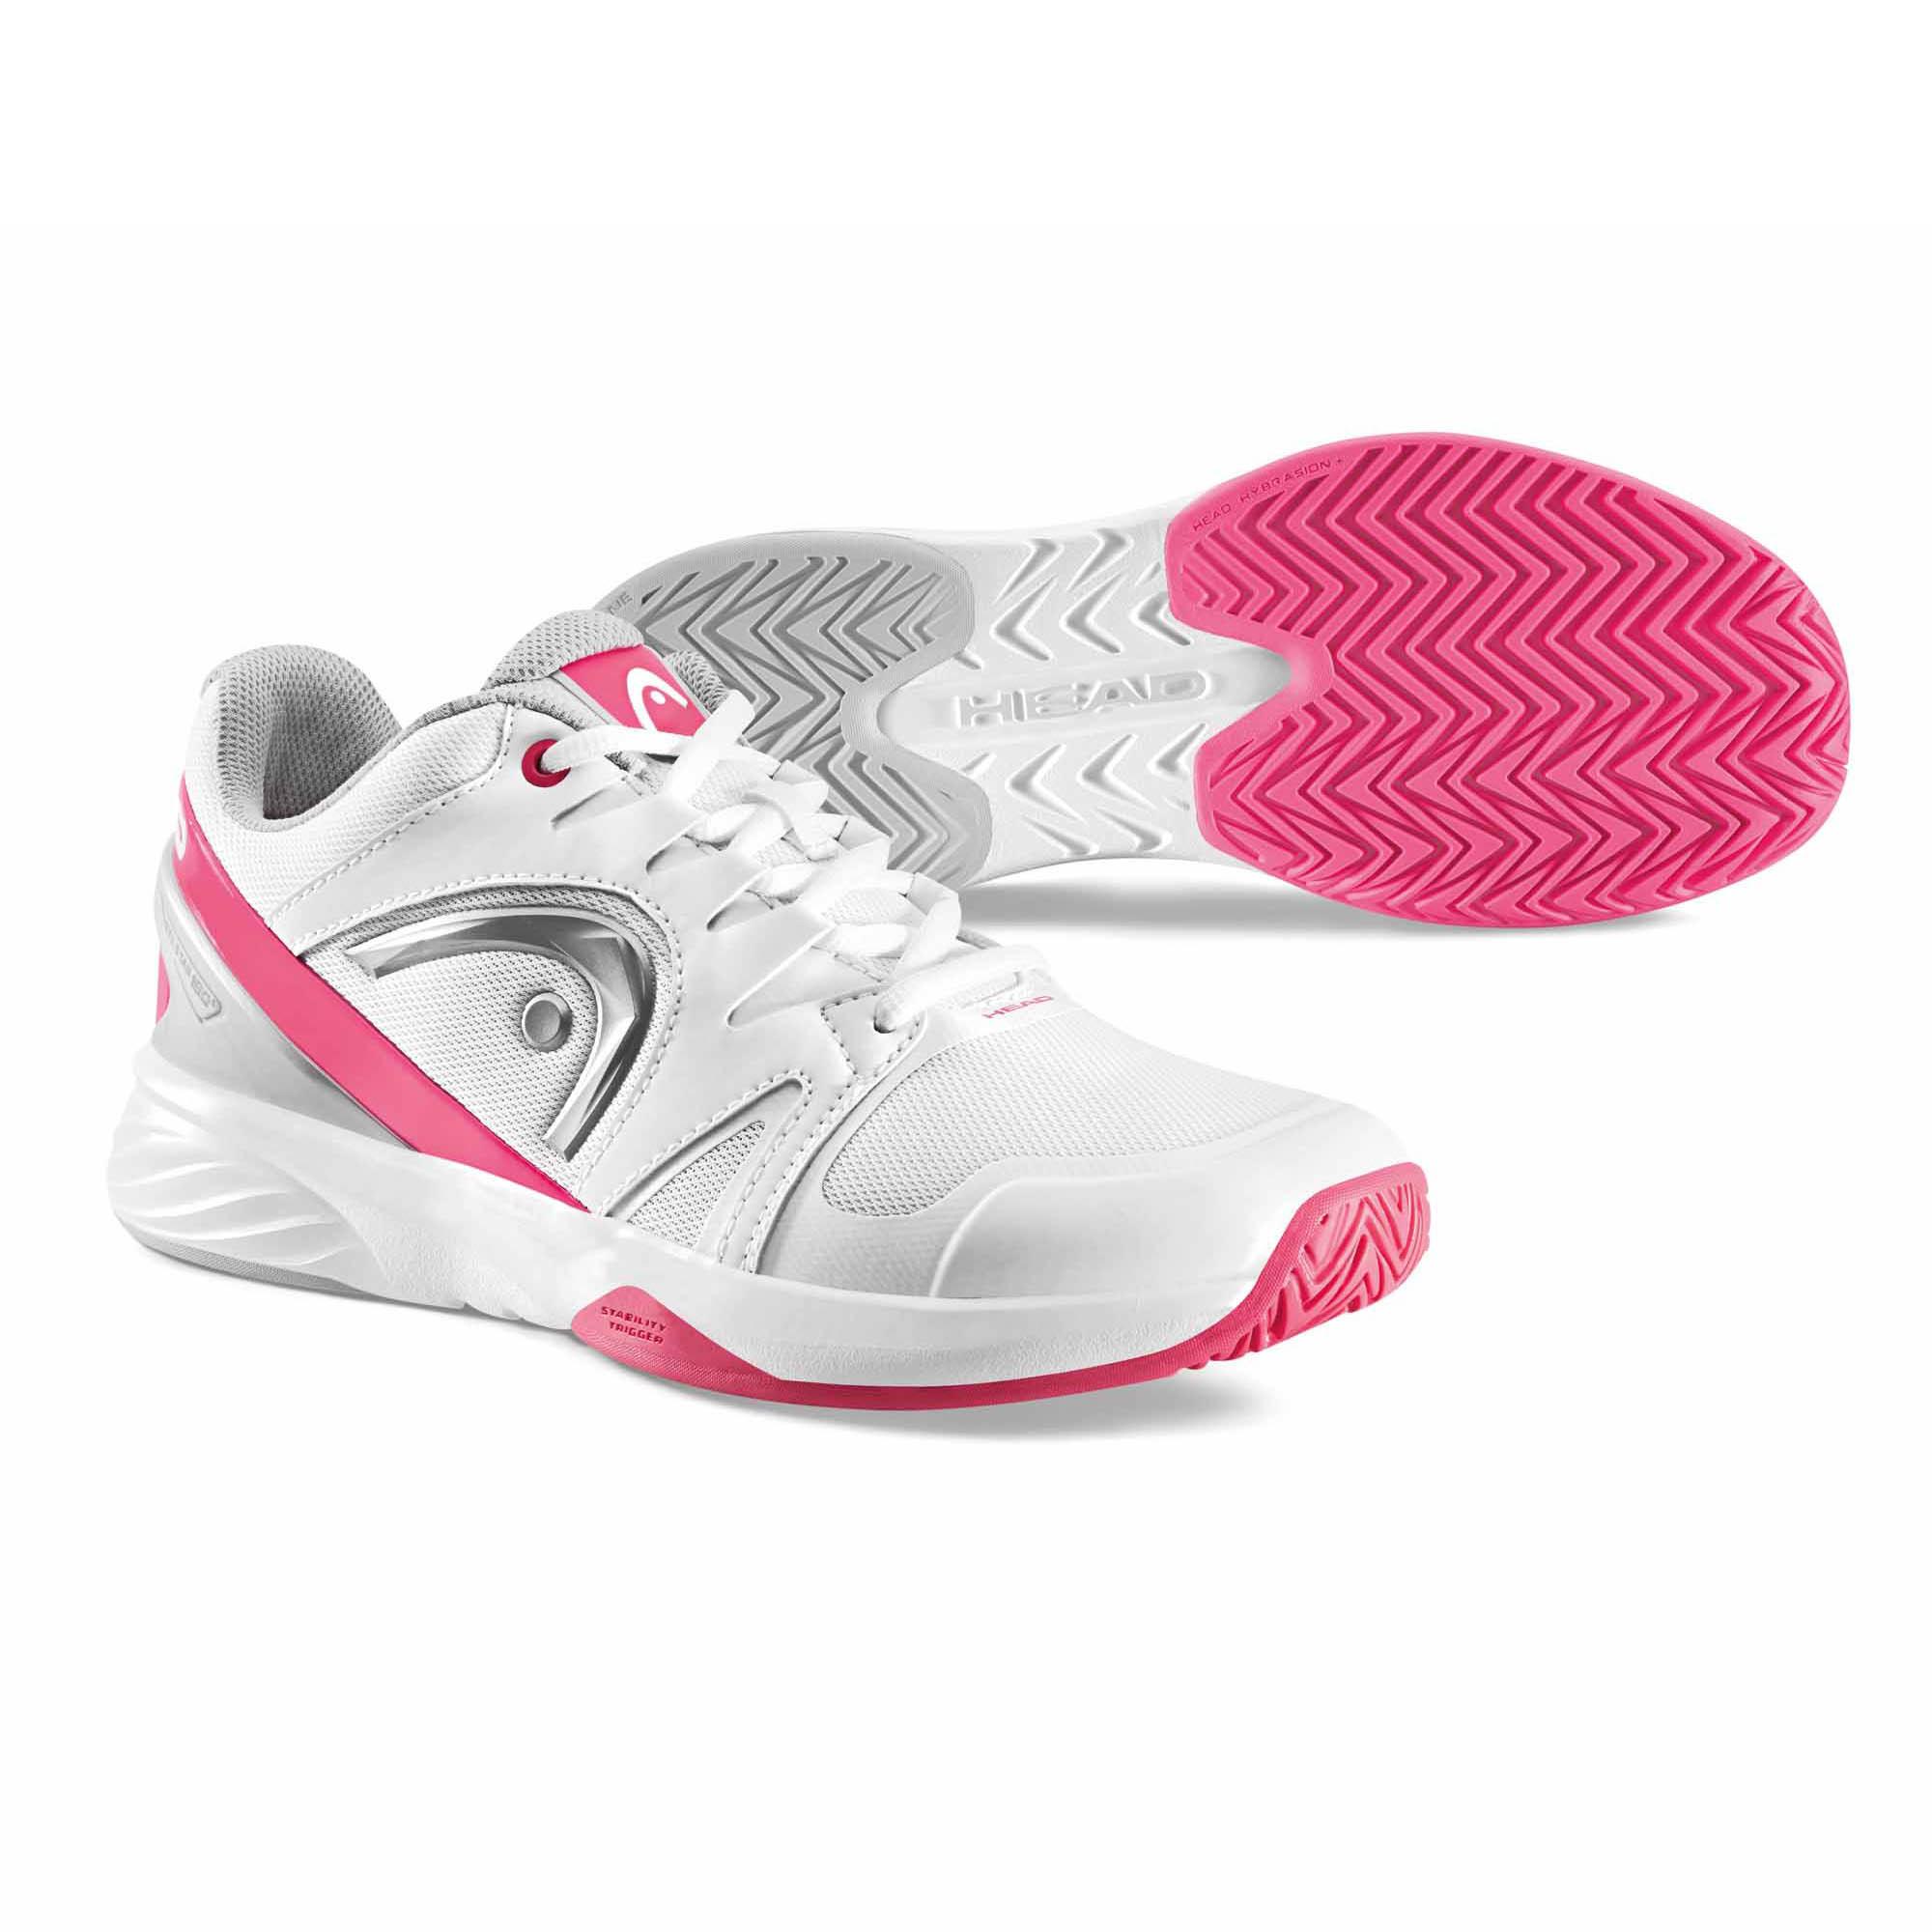 Head Nitro Team Ladies Tennis Shoes  7 UK